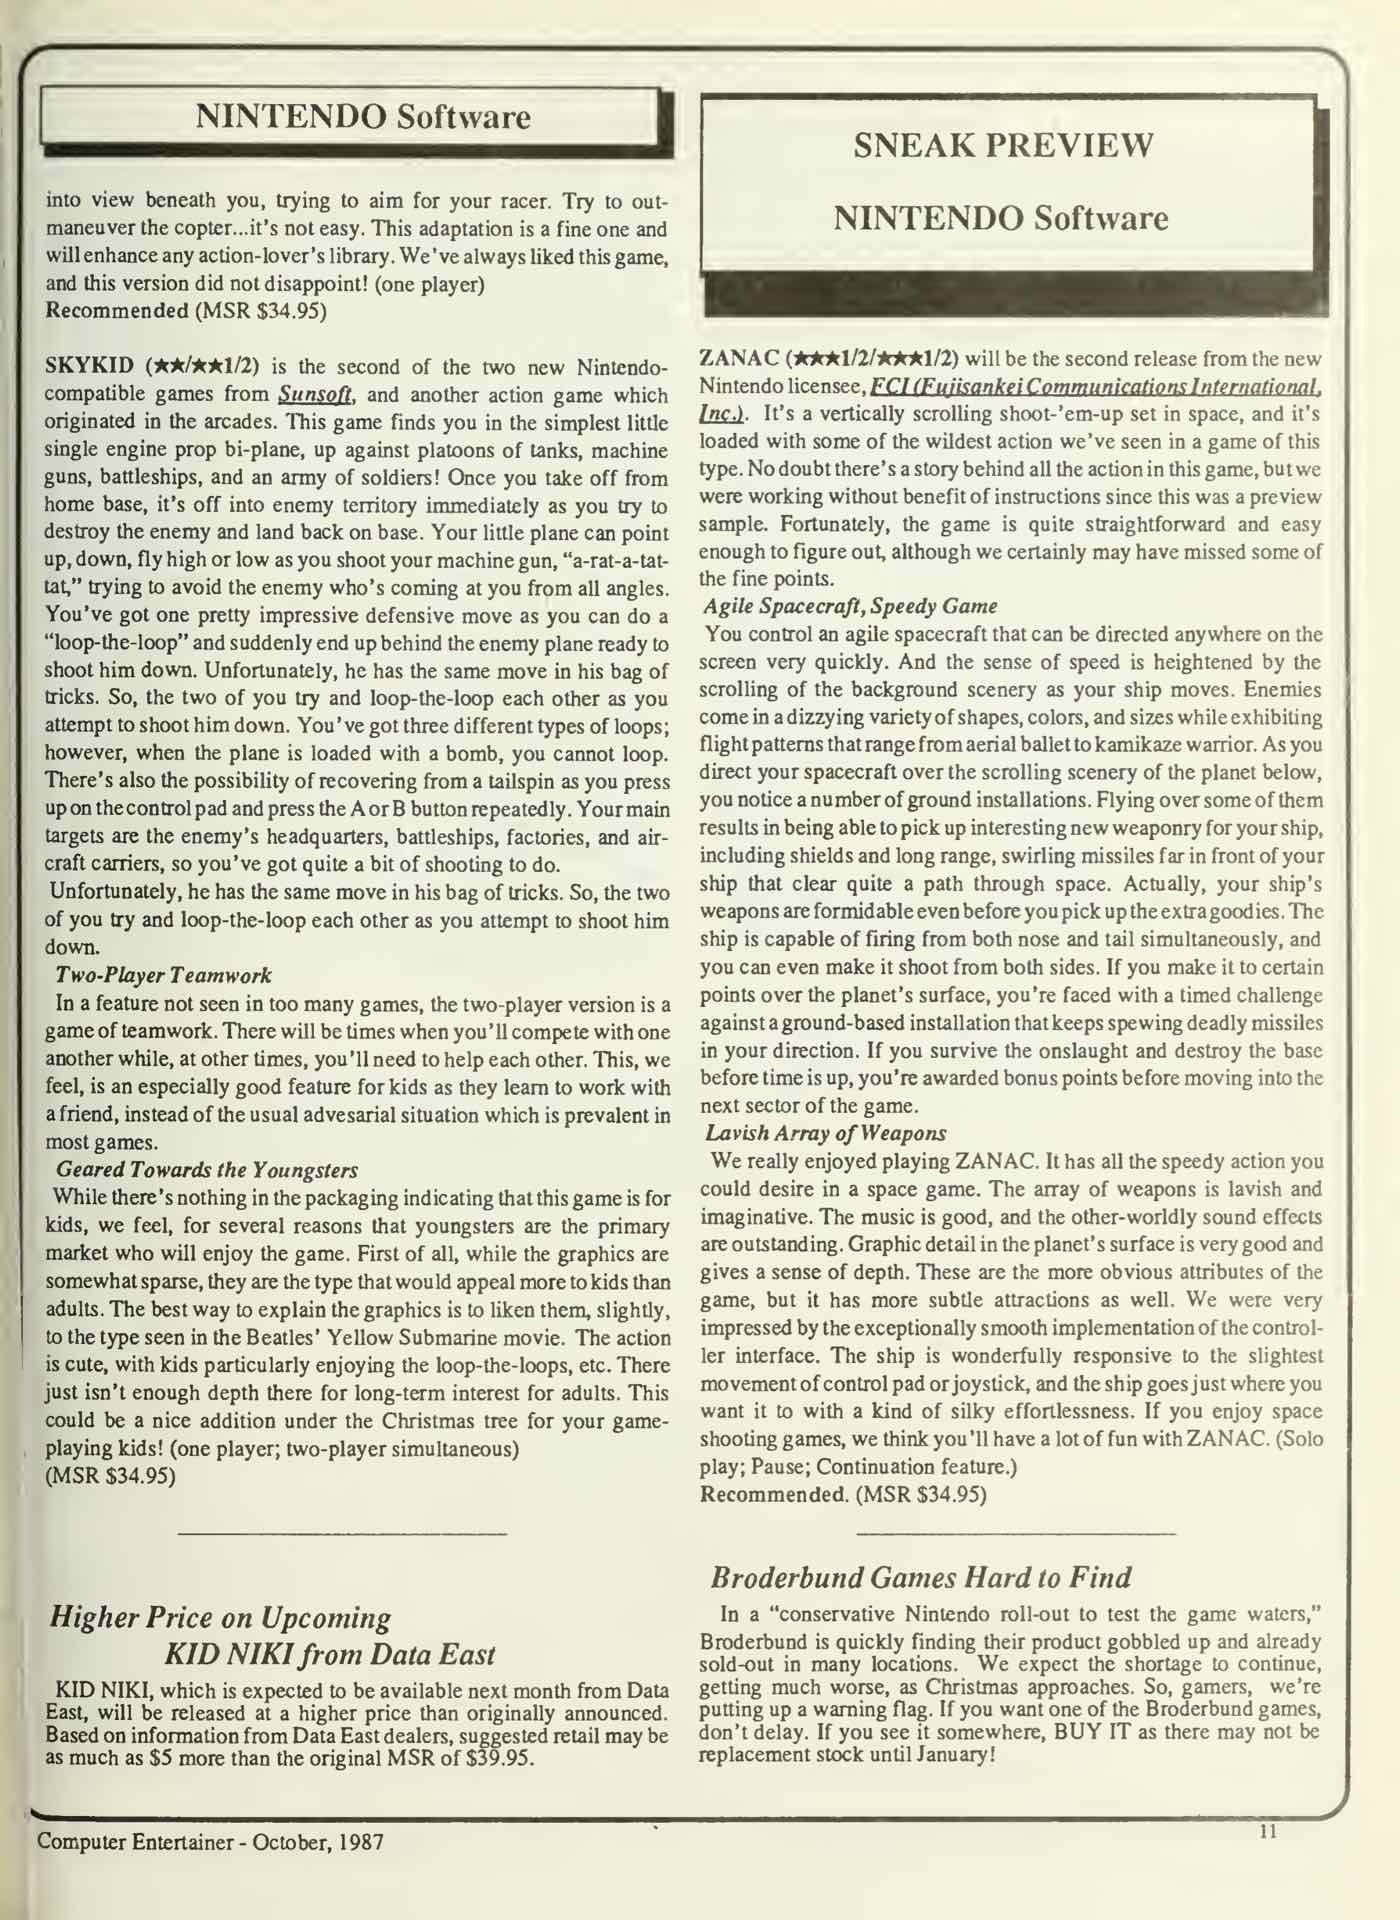 Computer Entertainer - October 1987 - p11